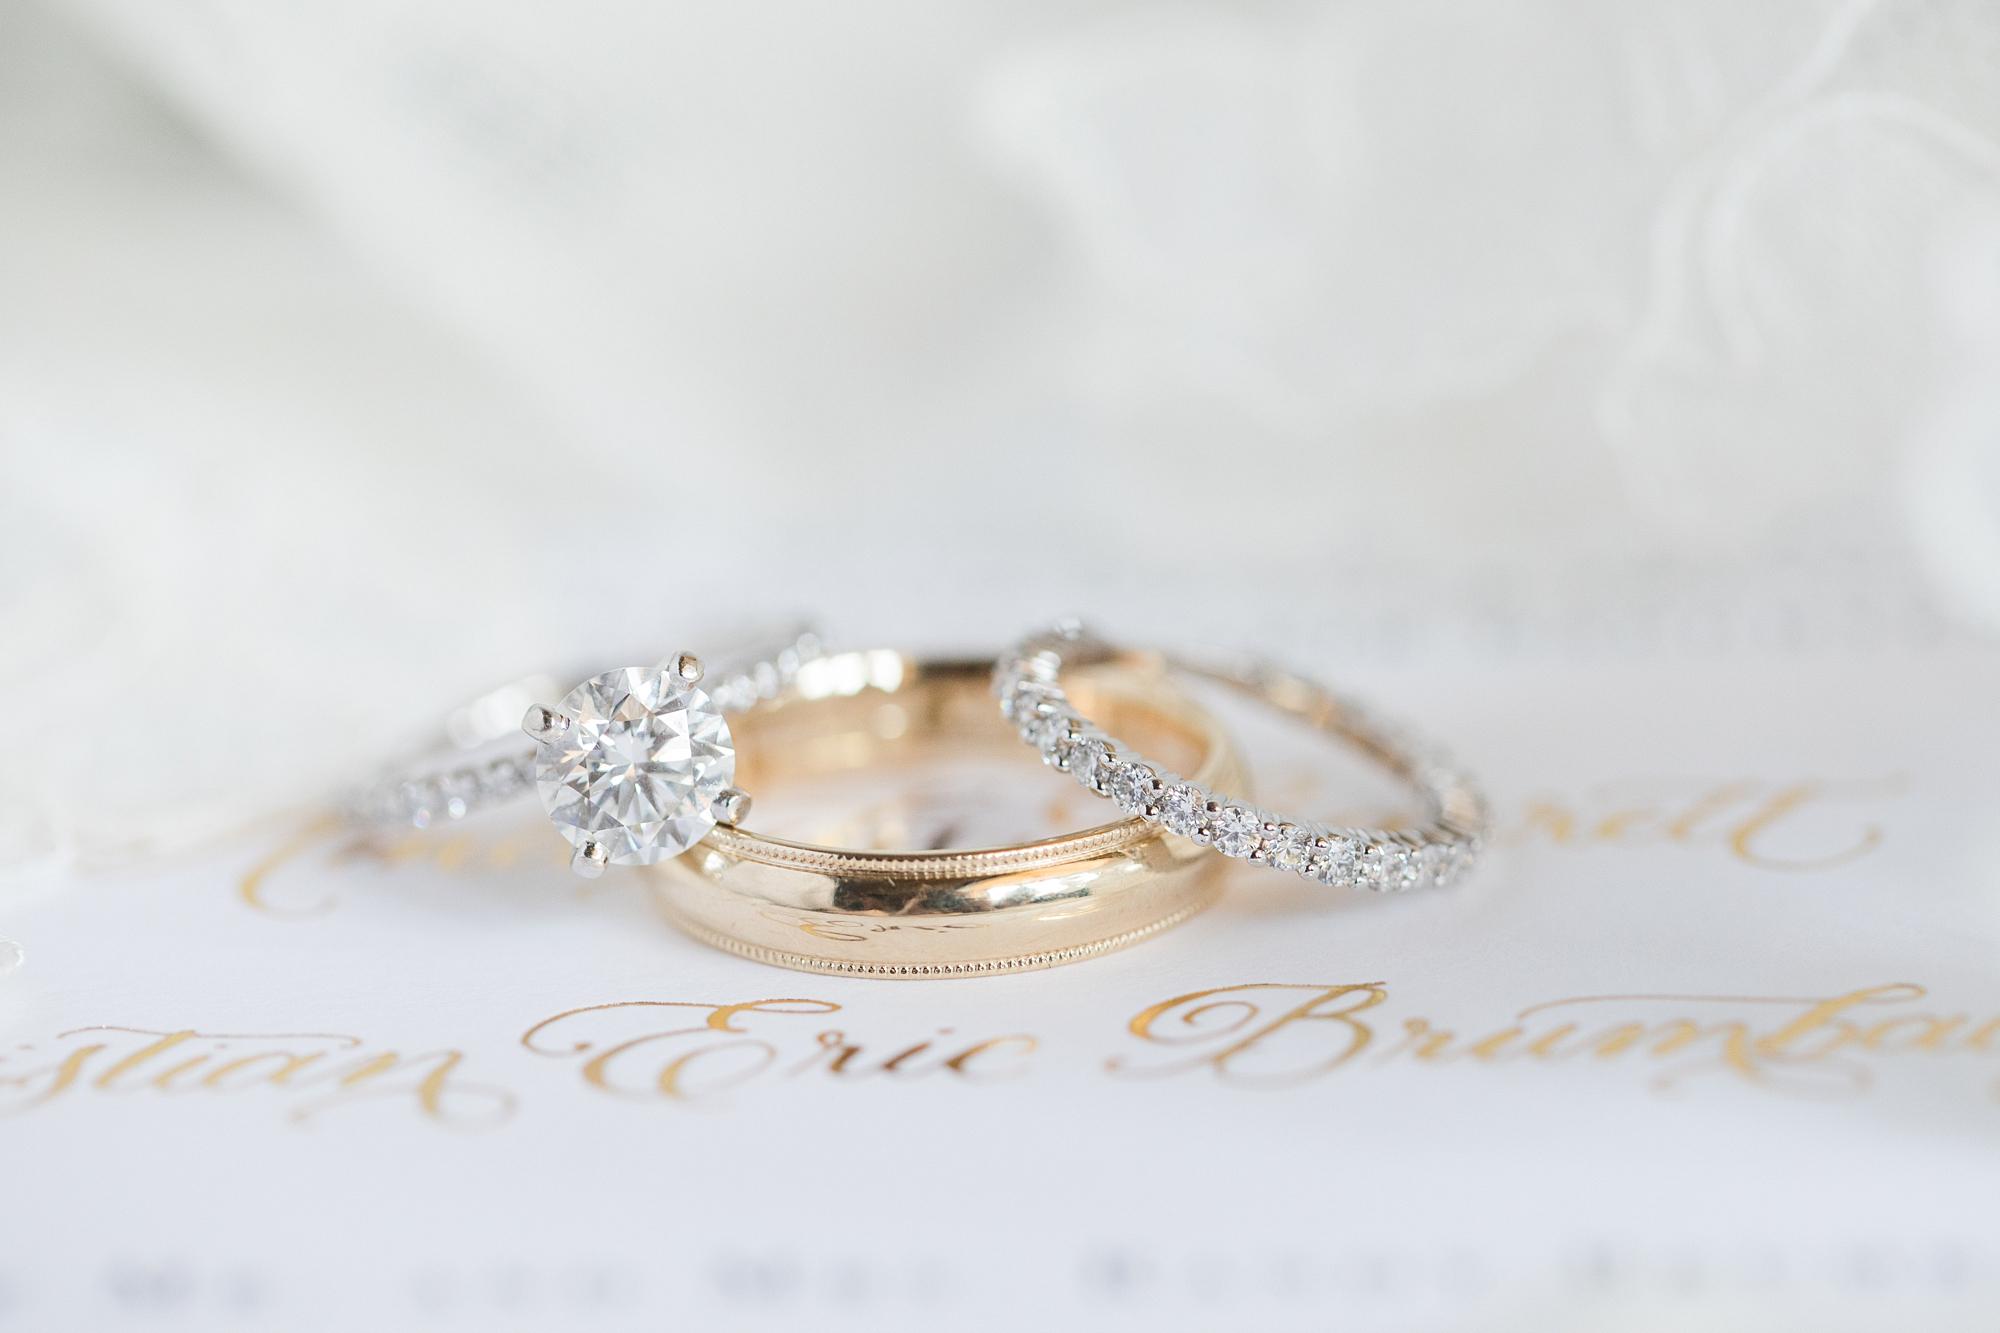 dover-hall-estate-richmond-wedding-goochland-virginiadover-hall-estate-richmond-wedding-goochland-virginia_5238